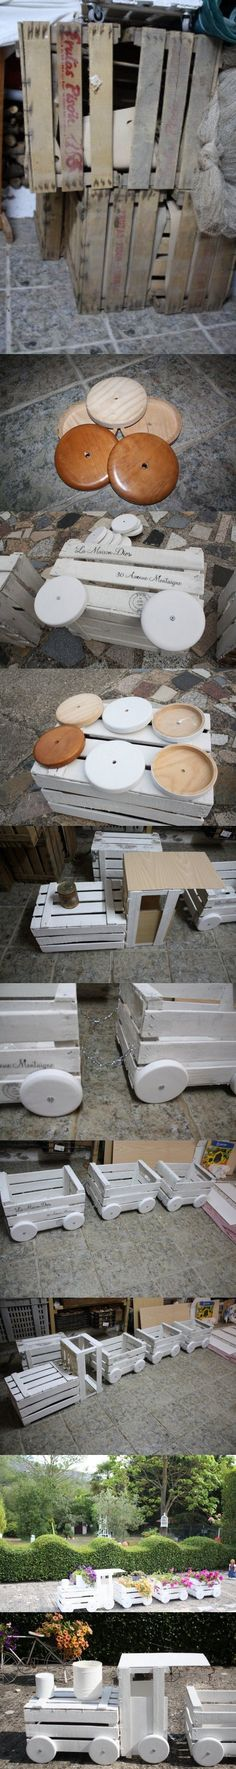 Ingeniosas macetas reciclando cajas de madera - facilisimo.com - DIY Wooden Train Planter